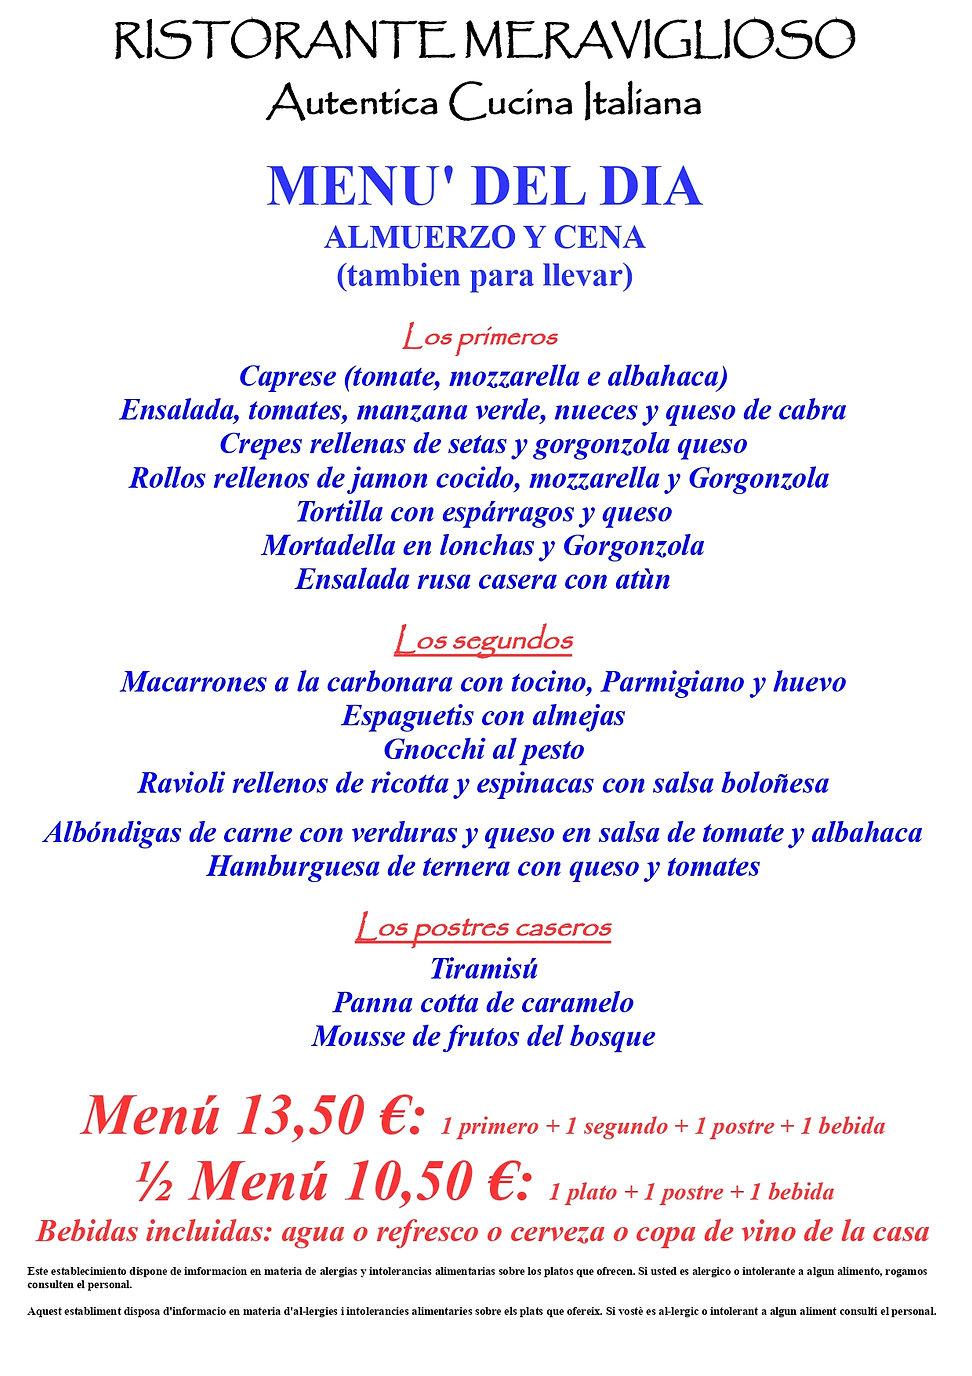 menù del dia_page-0001 (1).jpg